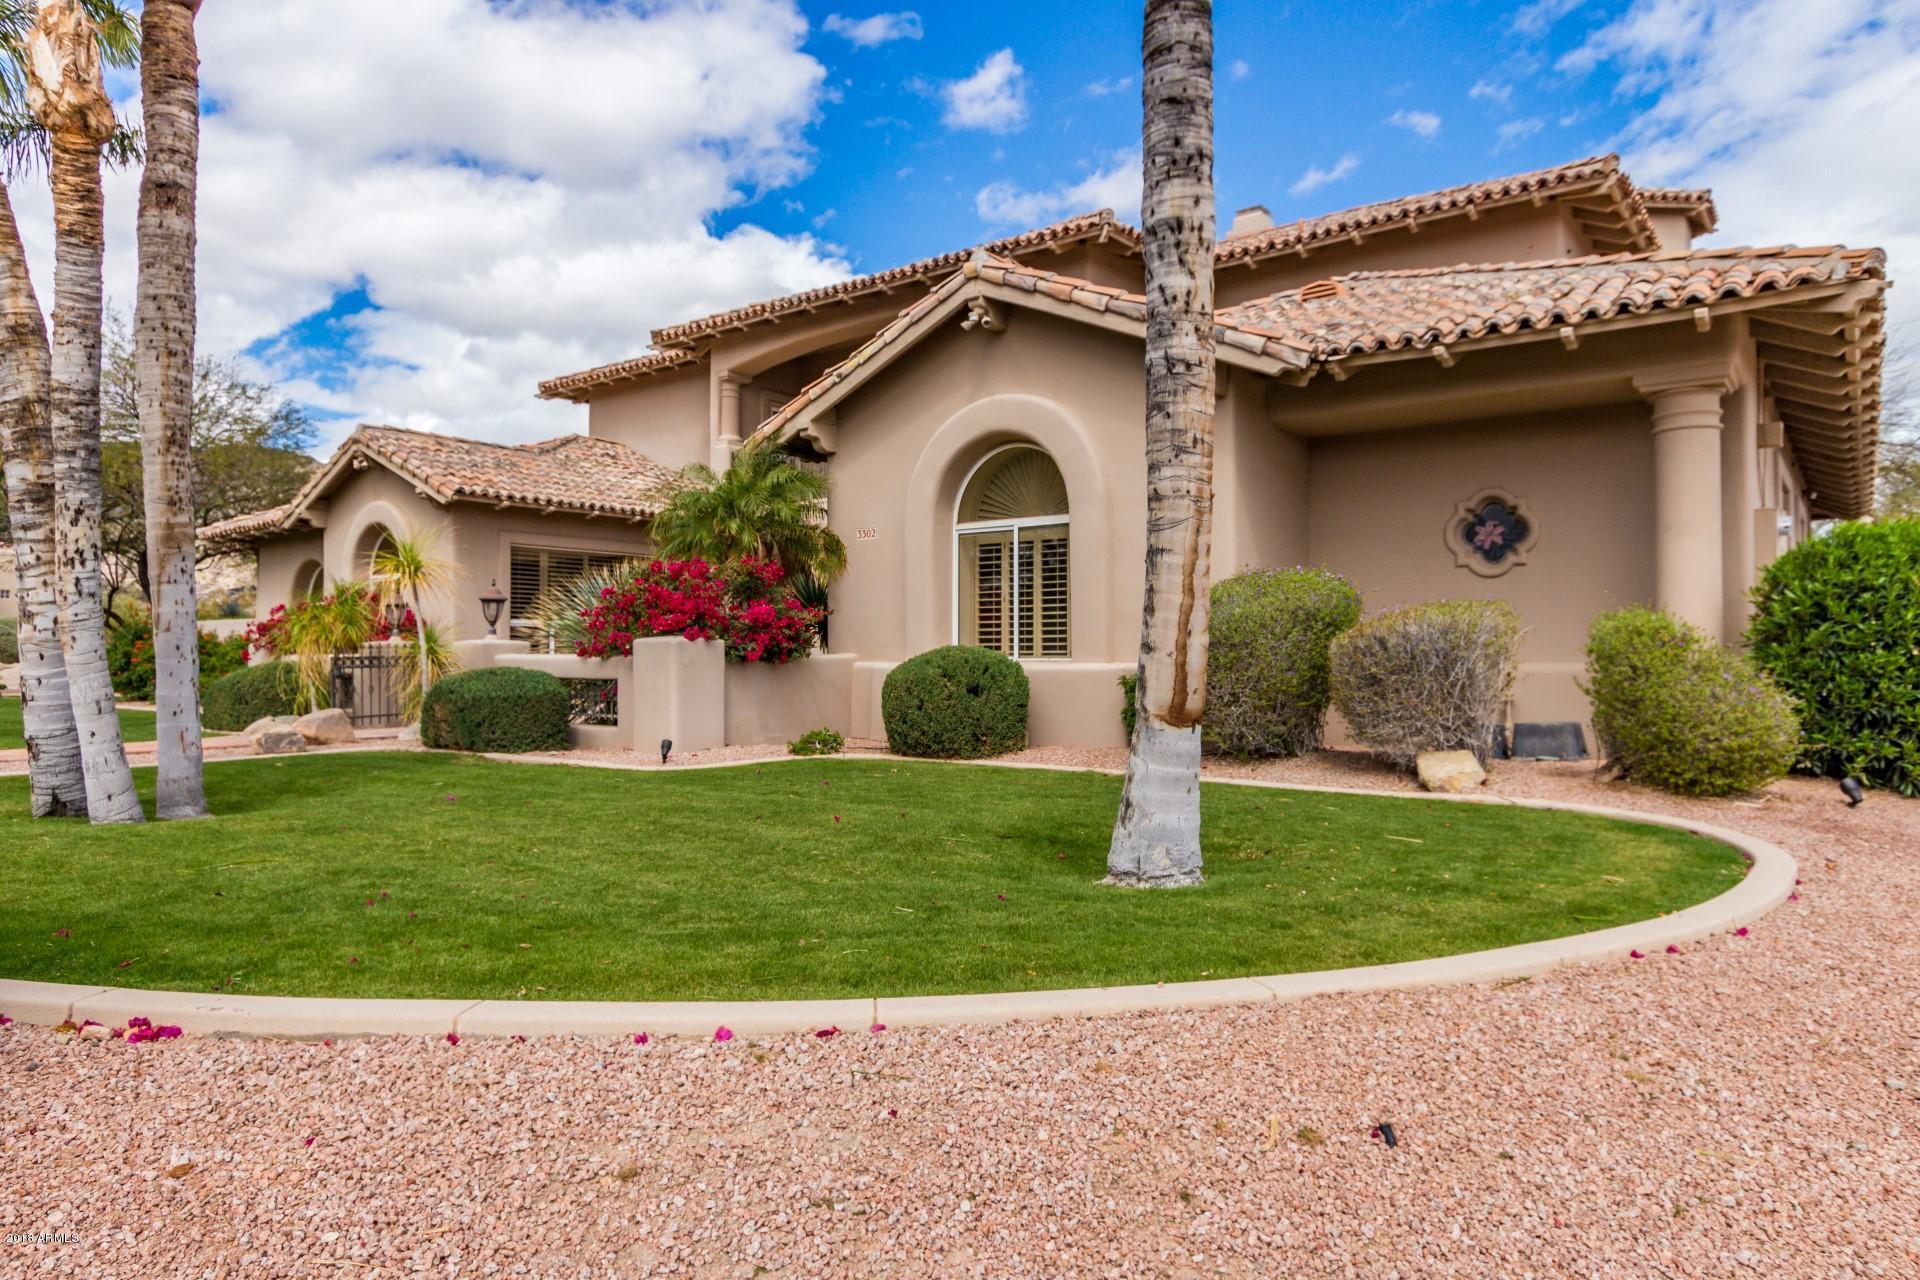 MLS 5740000 3302 E TONTO Drive, Phoenix, AZ 85044 ZipCode 85044